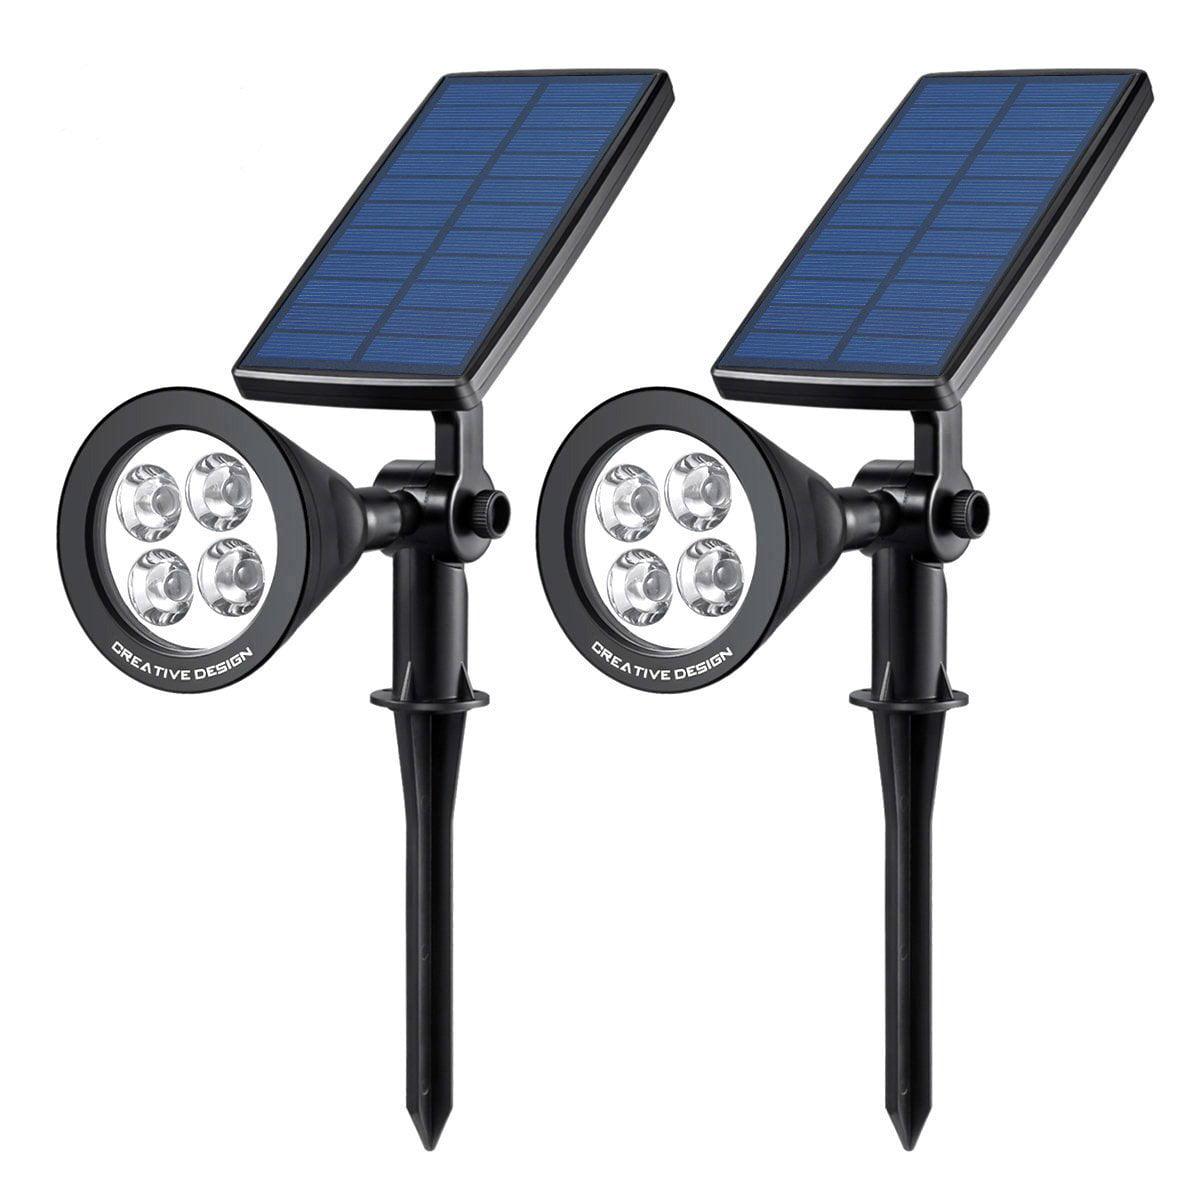 Solar Lights, CREATIVE DESIGN Solar Spotlight, Outdoor Garden Landscape Lighting, 350° Angle Adjustable Waterproof Wall Light Security Light with Auto On/Off (Black)(2 PCS Pack)